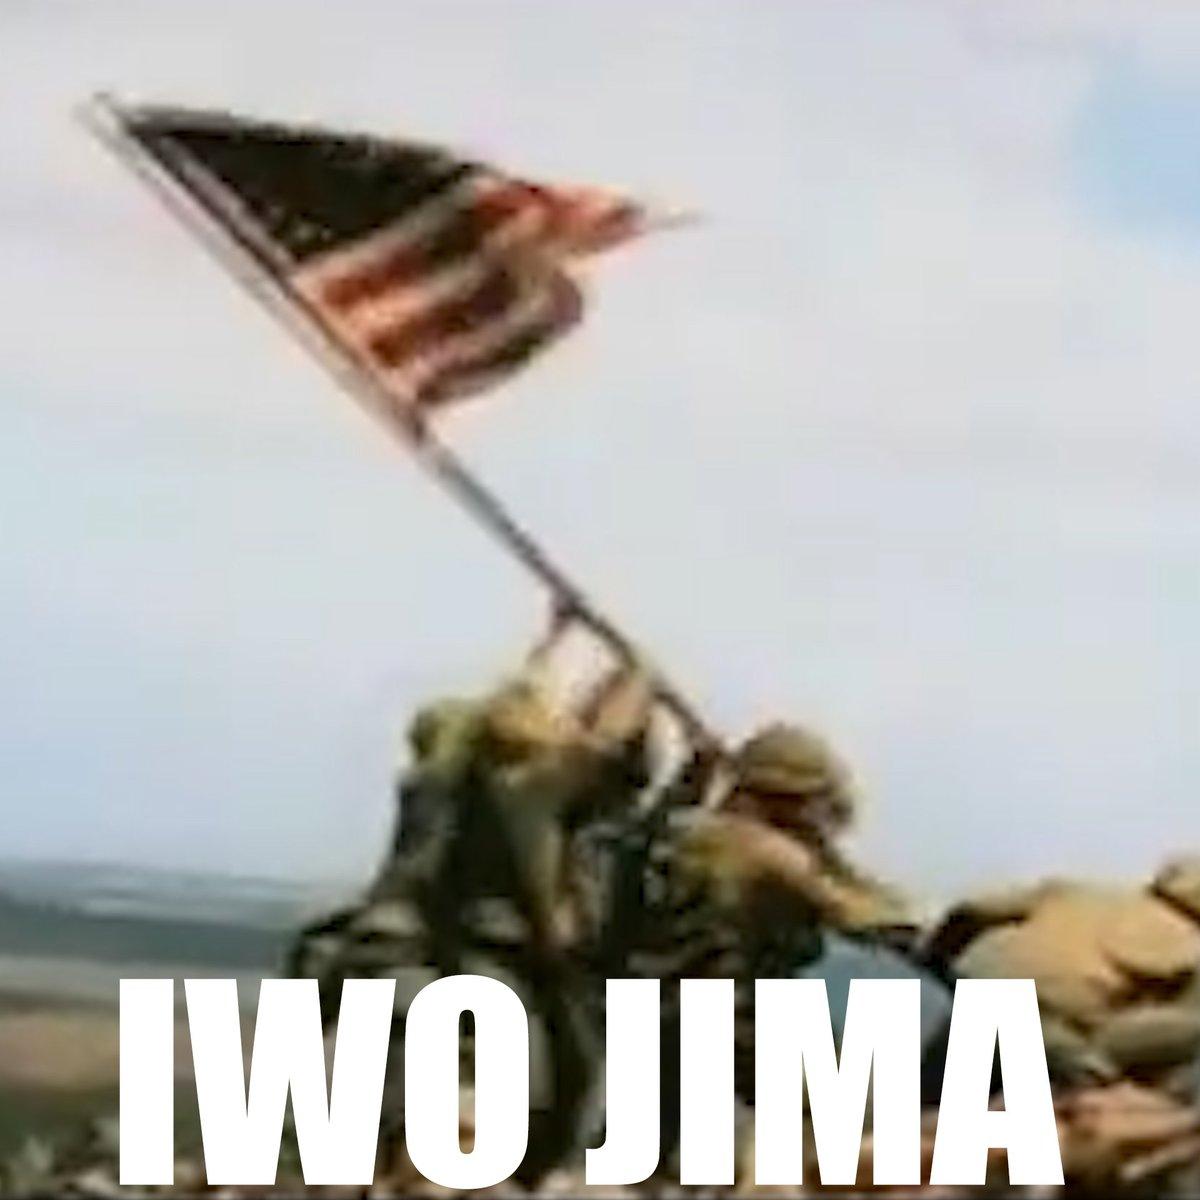 74 years ago today, Marines on Iwo Jima raised the flag atop Mount Suribachi.  Semper Fidelis.